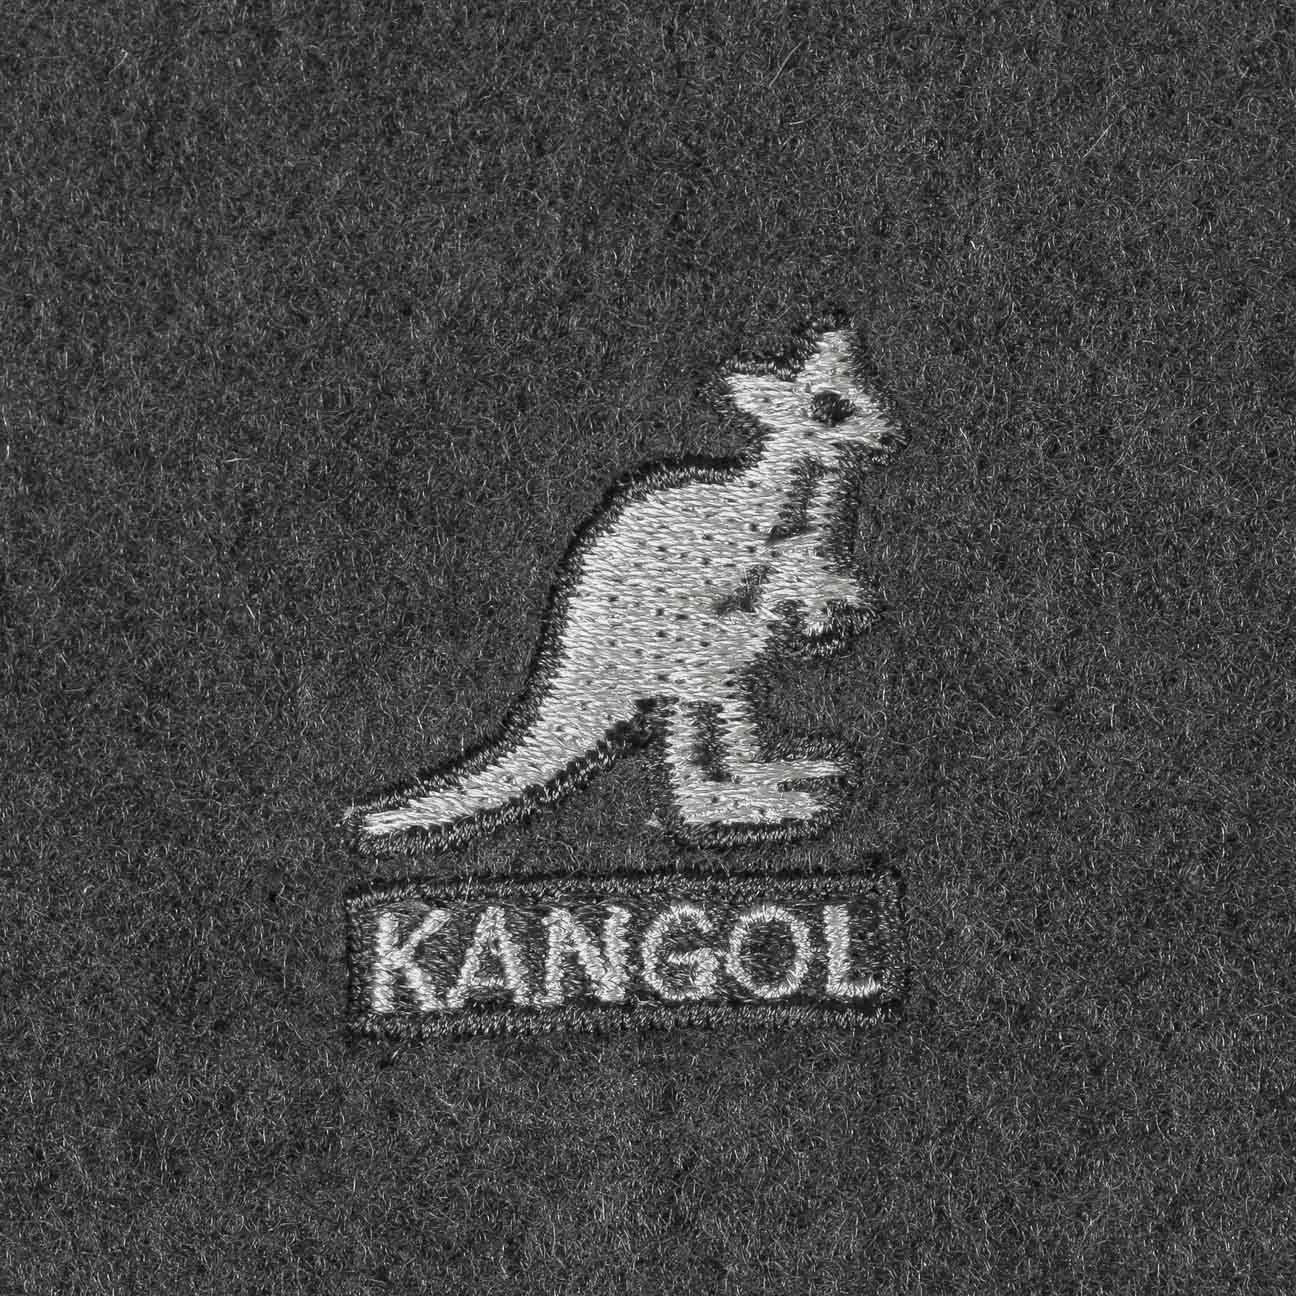 Flacher Dark Wolle Kangol 504 Flannel hut Capivy fTw56n5qc